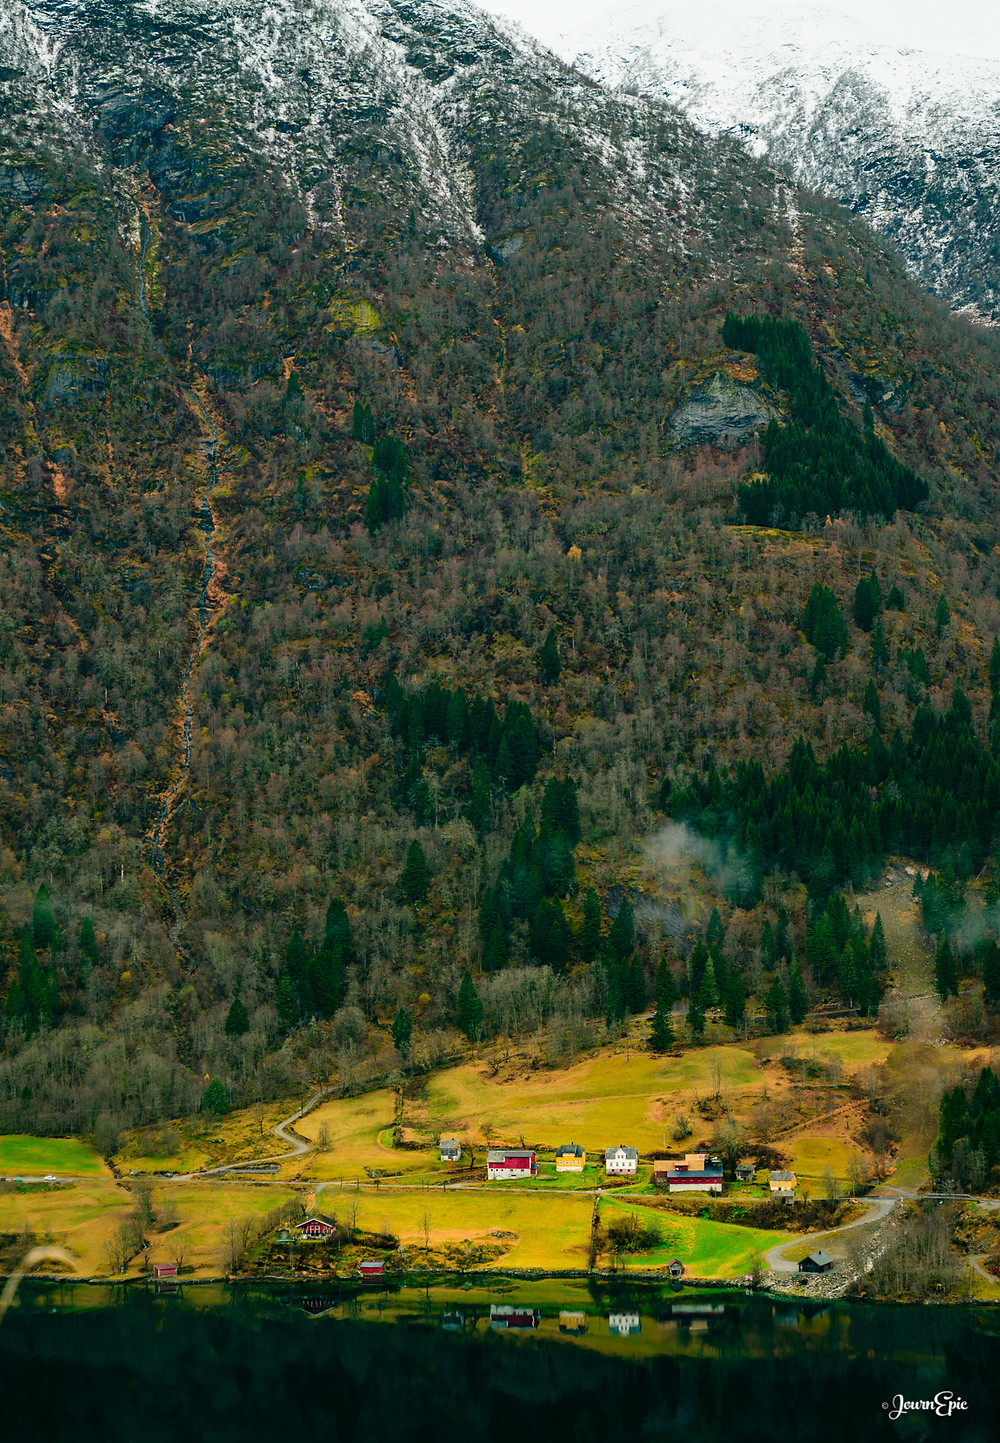 Fjærlandsfjorden, Norway, Norway fjords, Things to visit in Norway, Norwegian landscape